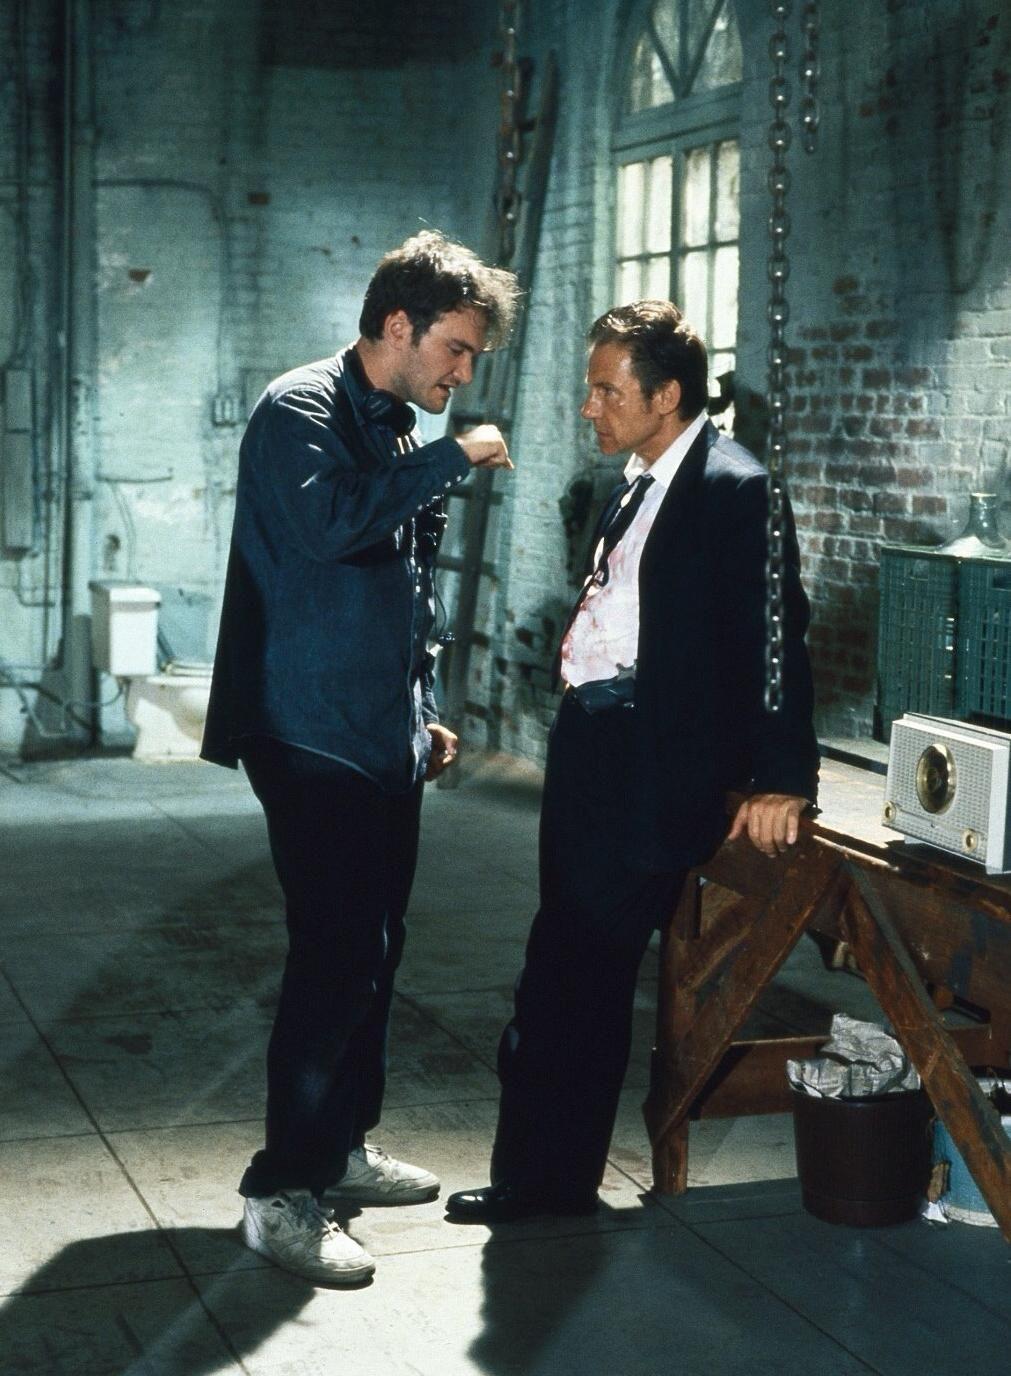 Pin by DeepBlue Seven on Tarantino BTS | Quentin tarantino, Reservoir dogs,  Quentin tarantino movies